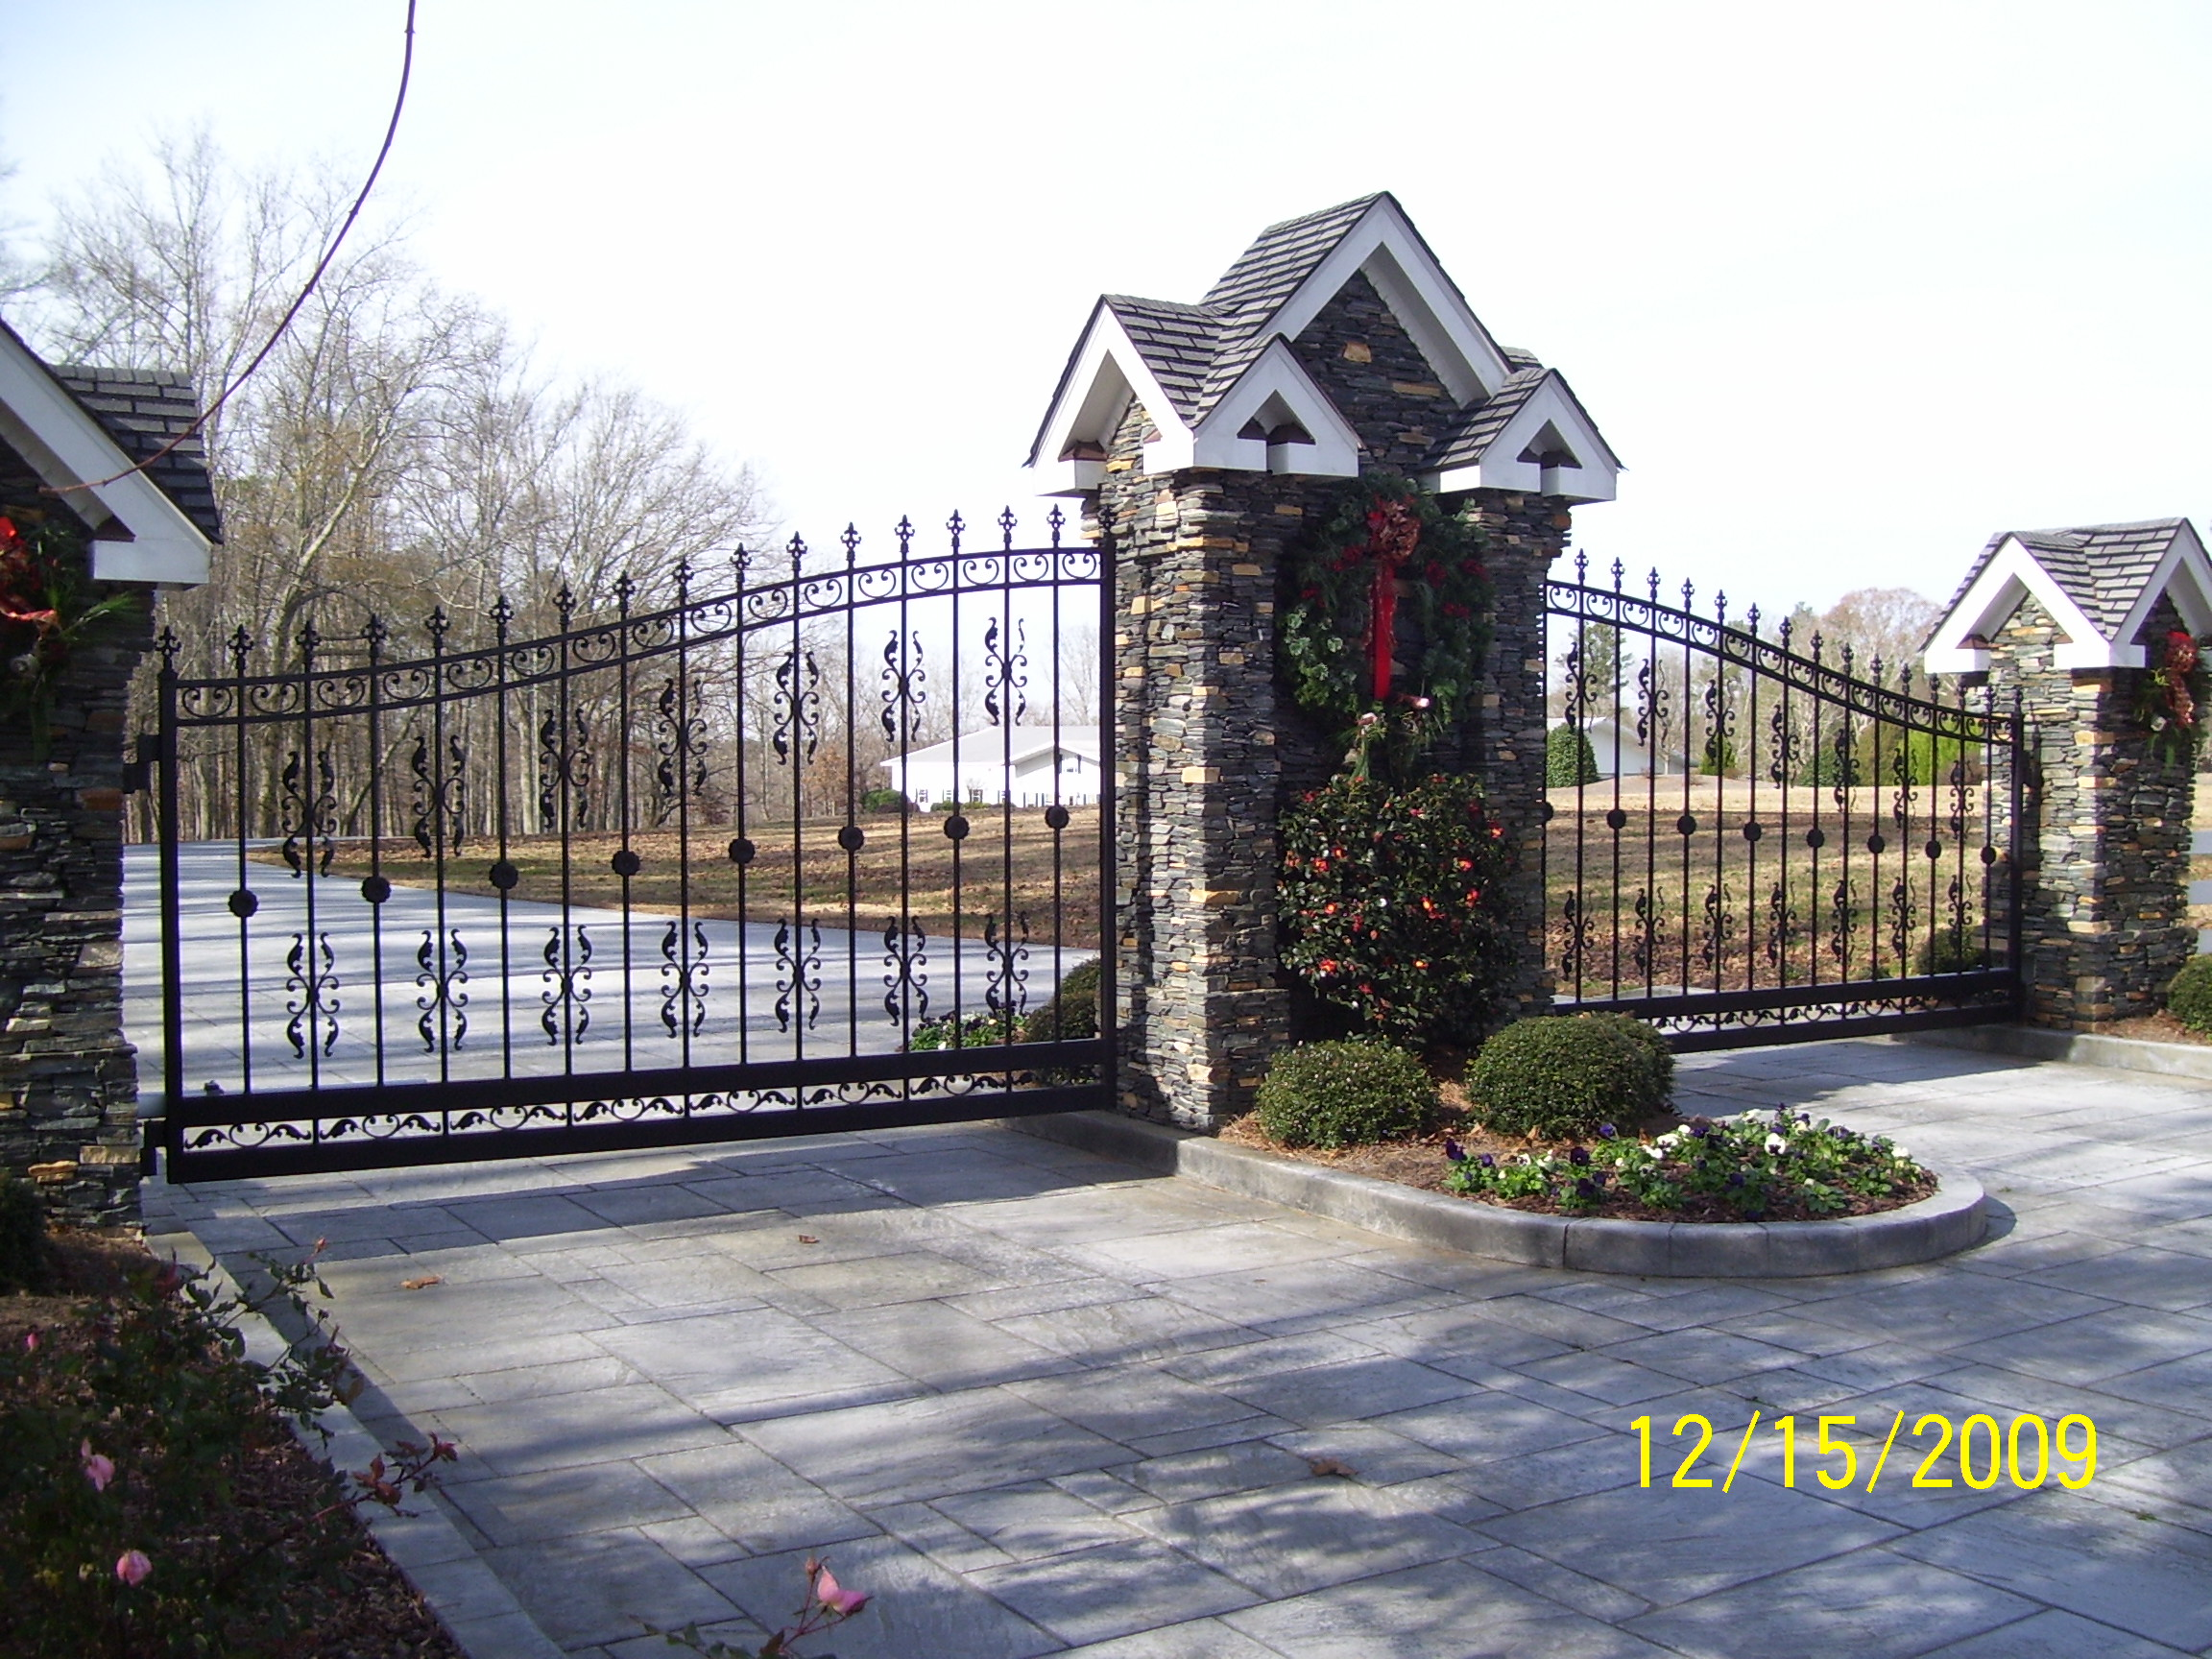 West georgia gate door inc carrollton ga 30117 for Garage door repair carrollton ga